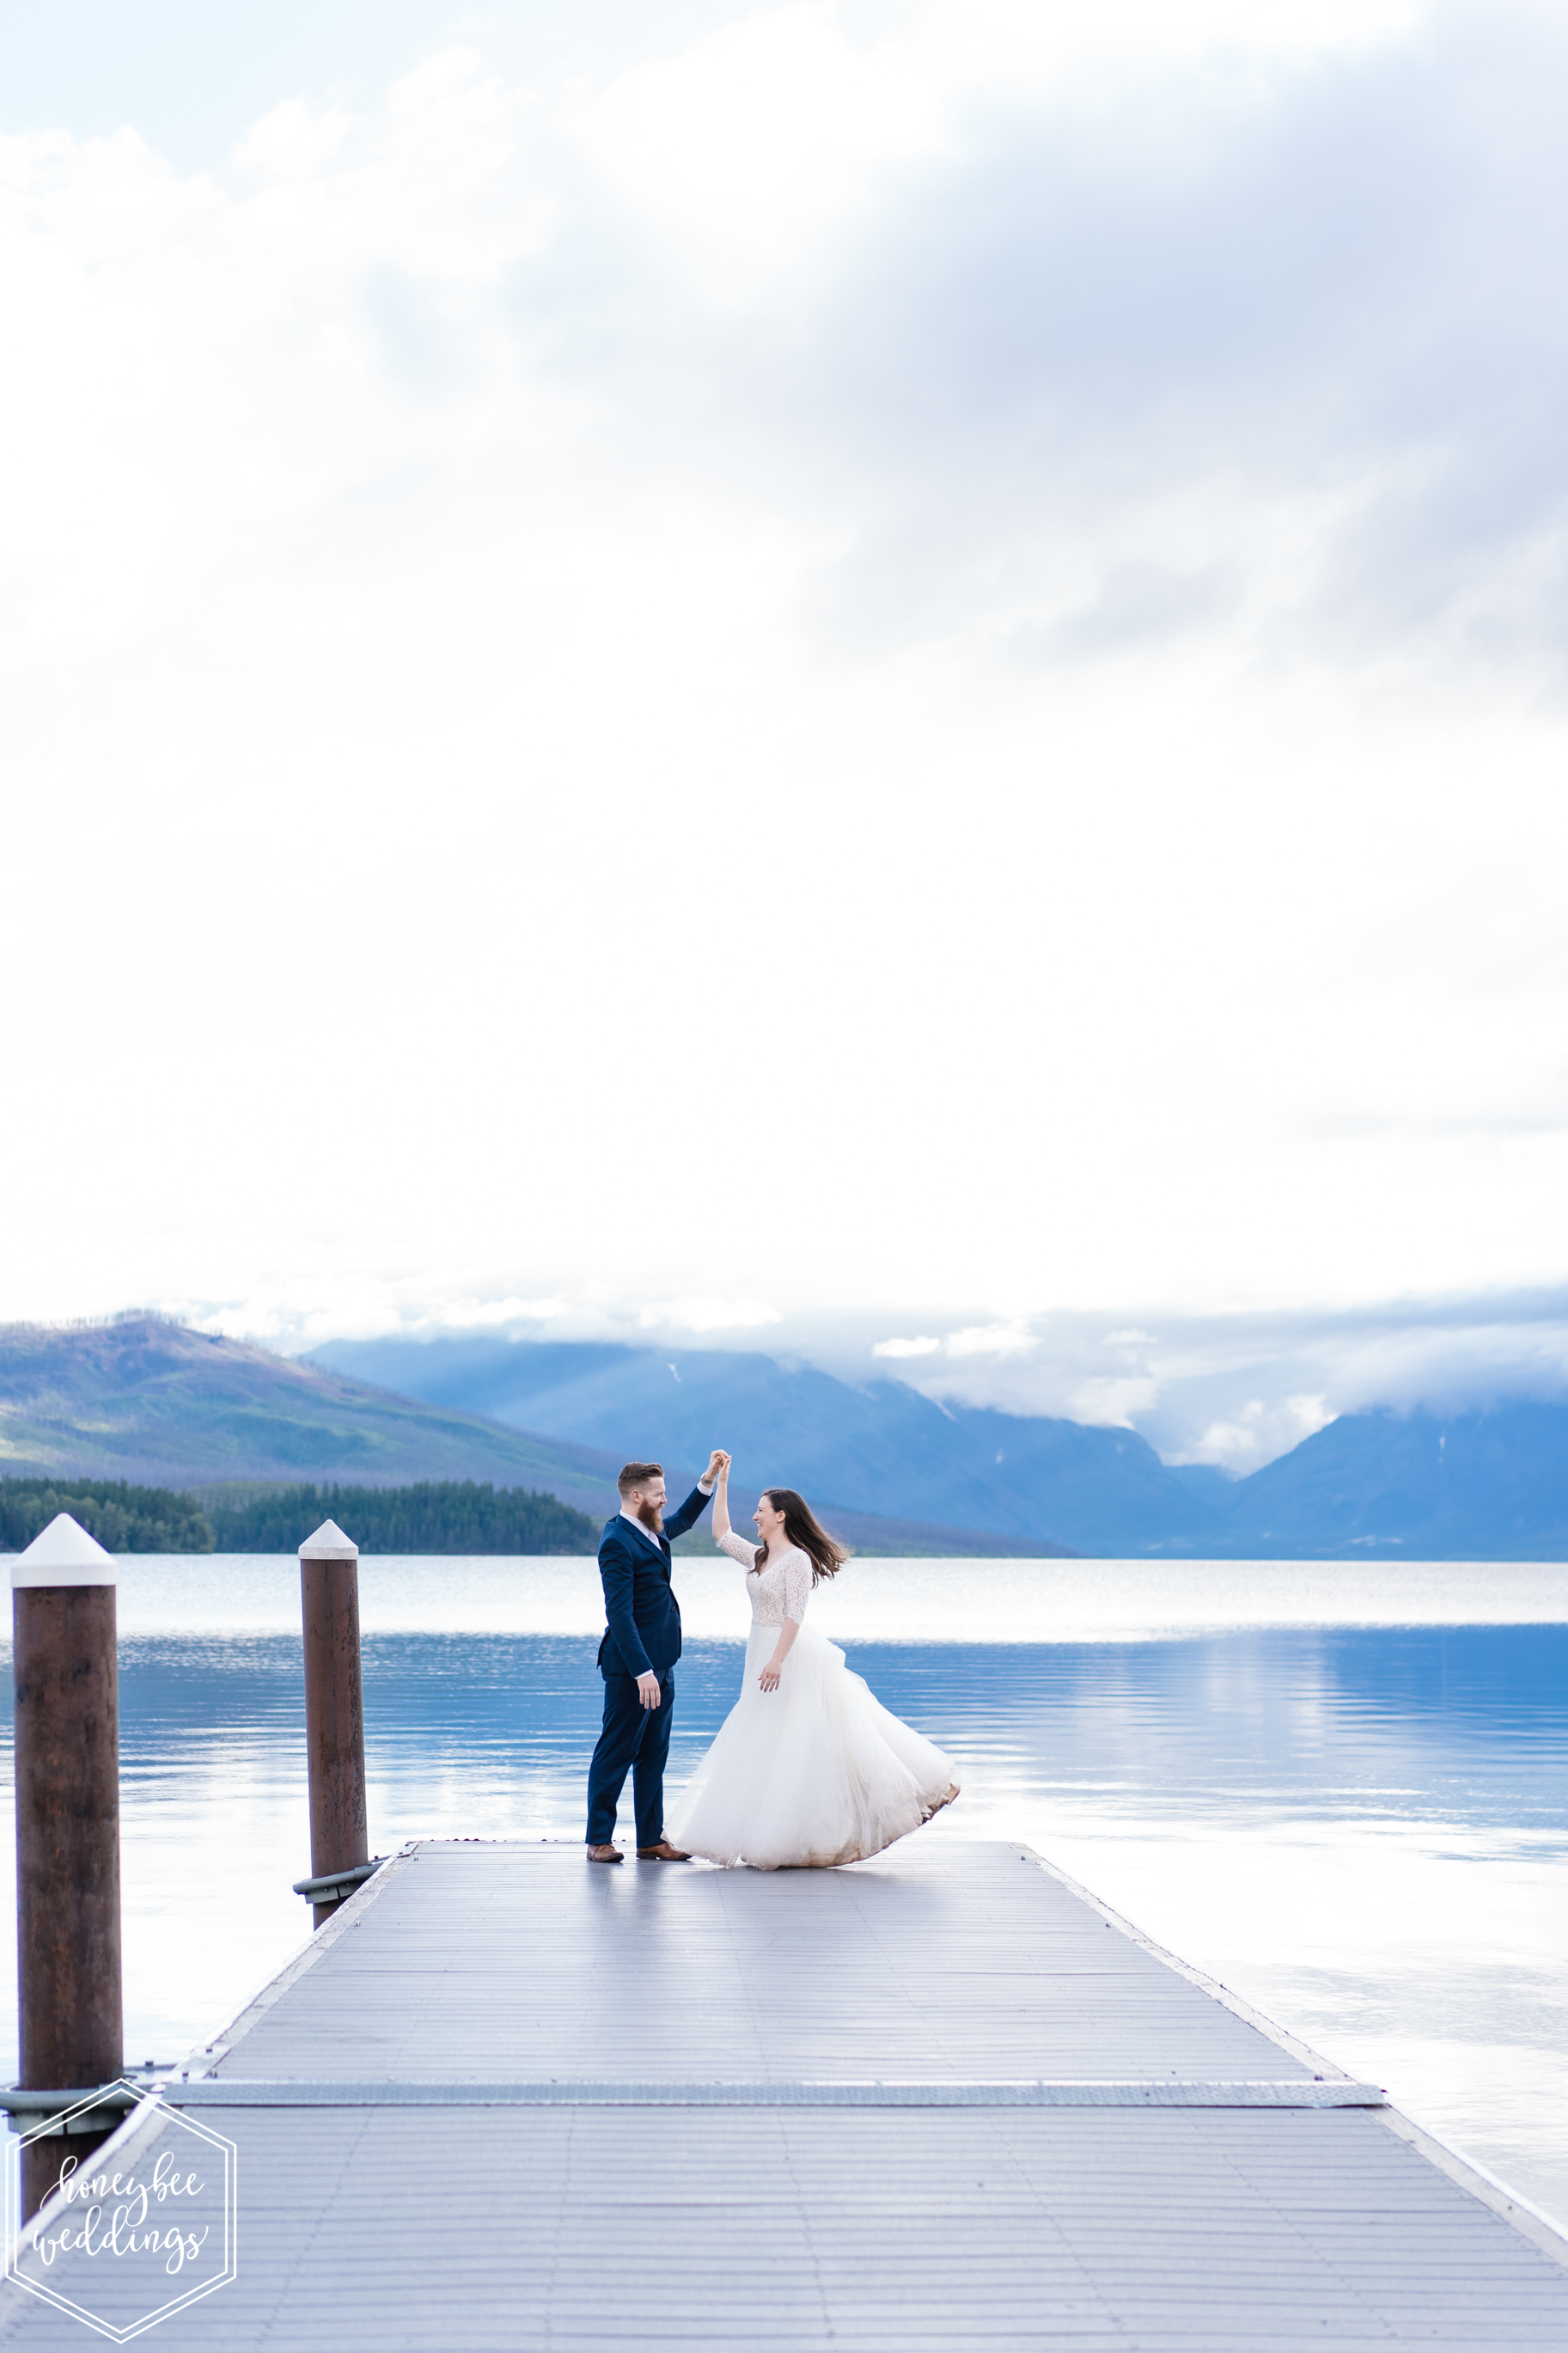 229Glacier National Park Wedding_Izaak Walton Inn Wedding_Honeybee Weddings_Norah & Kyle_June 09, 2019-48.jpg